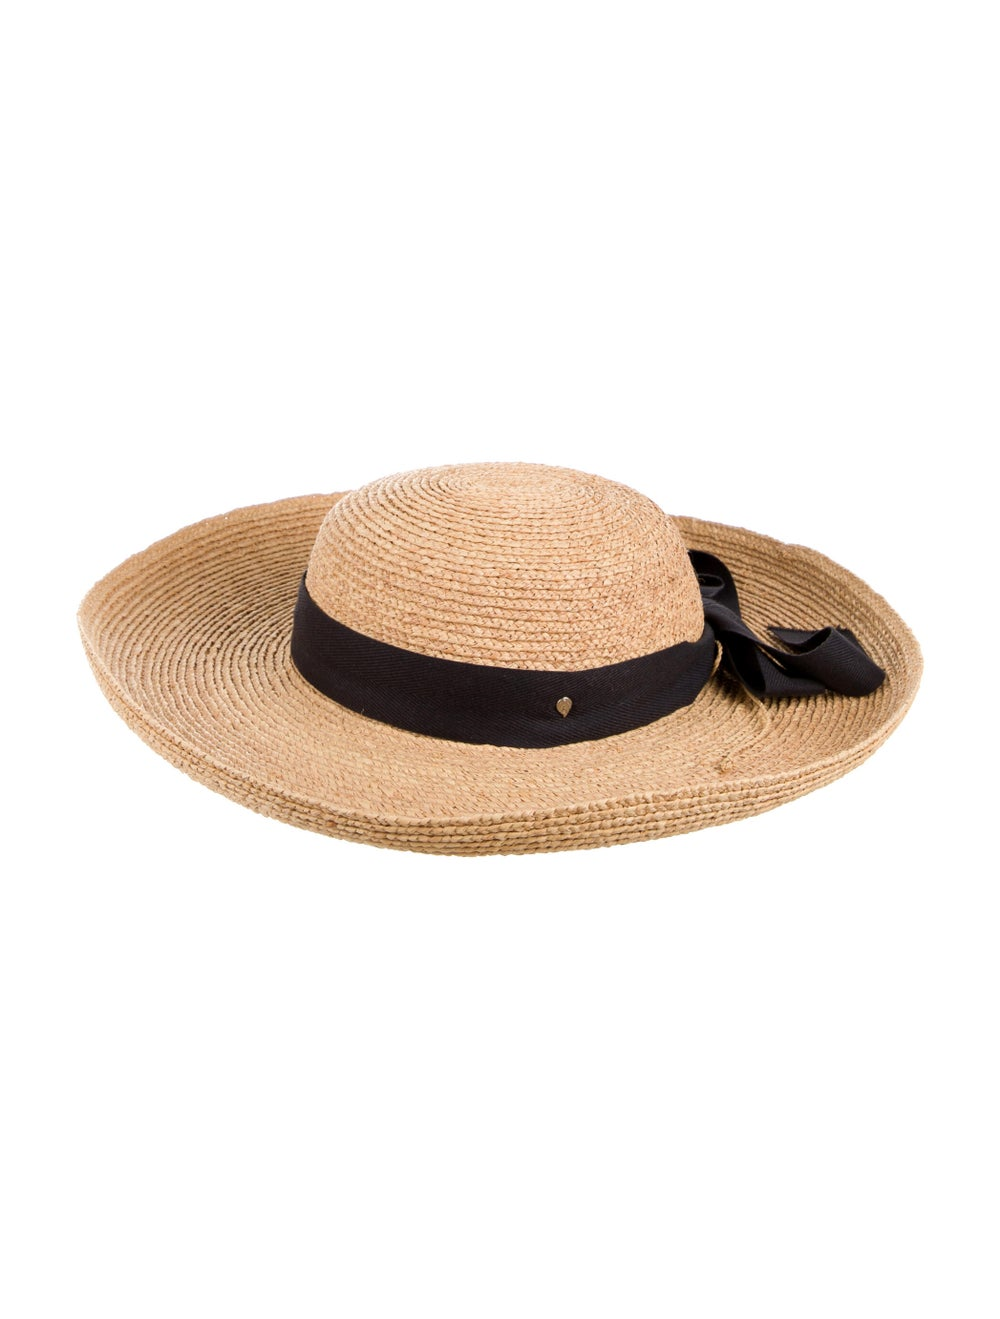 Helen Kaminski Wide Brim Hat - image 2